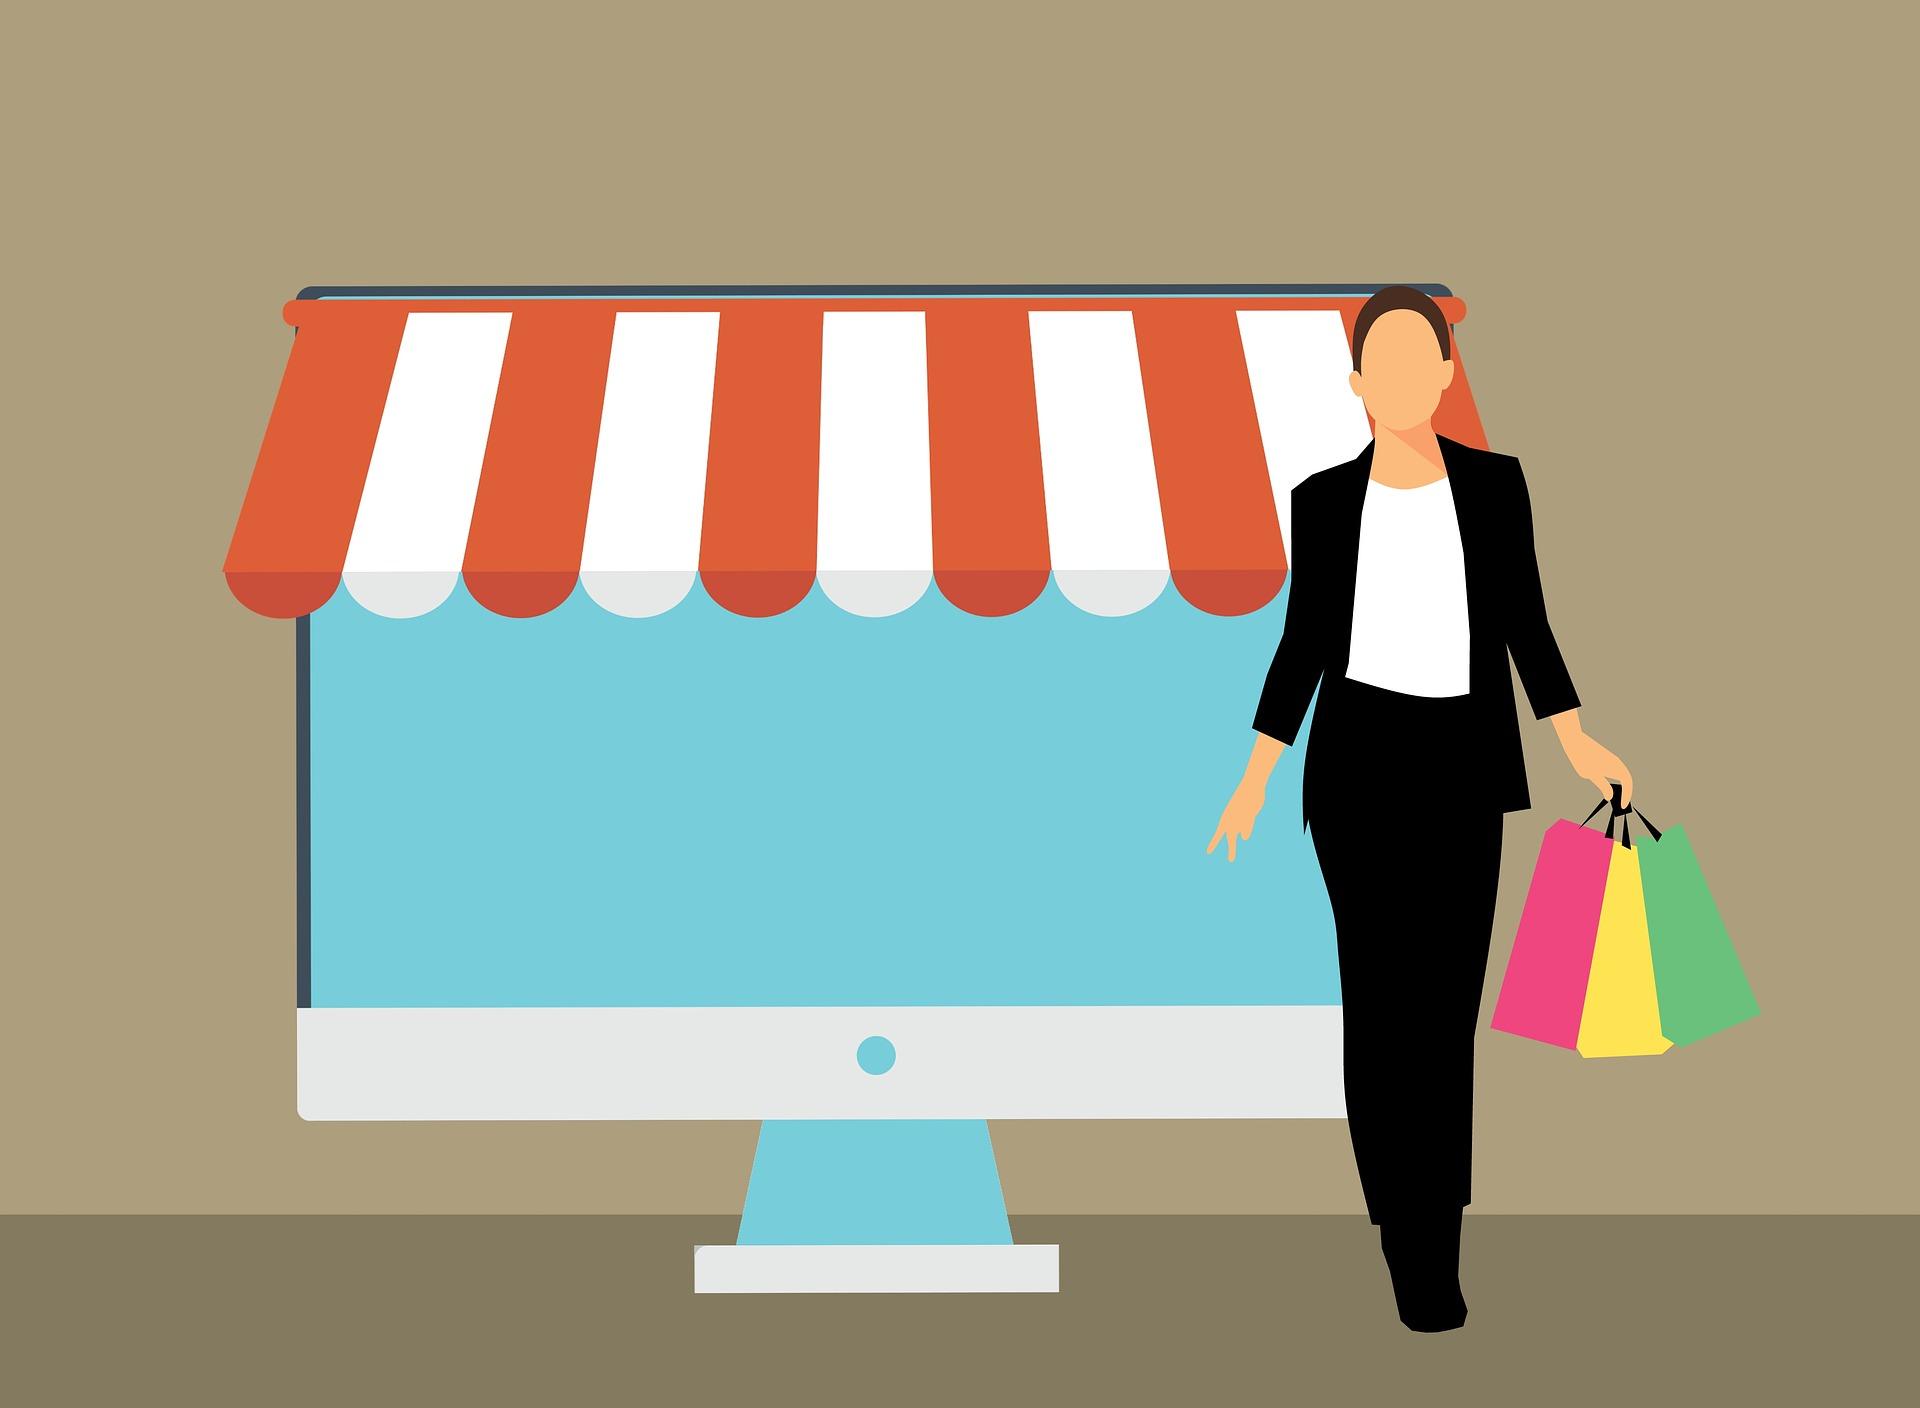 Shopping online 3202912 1920